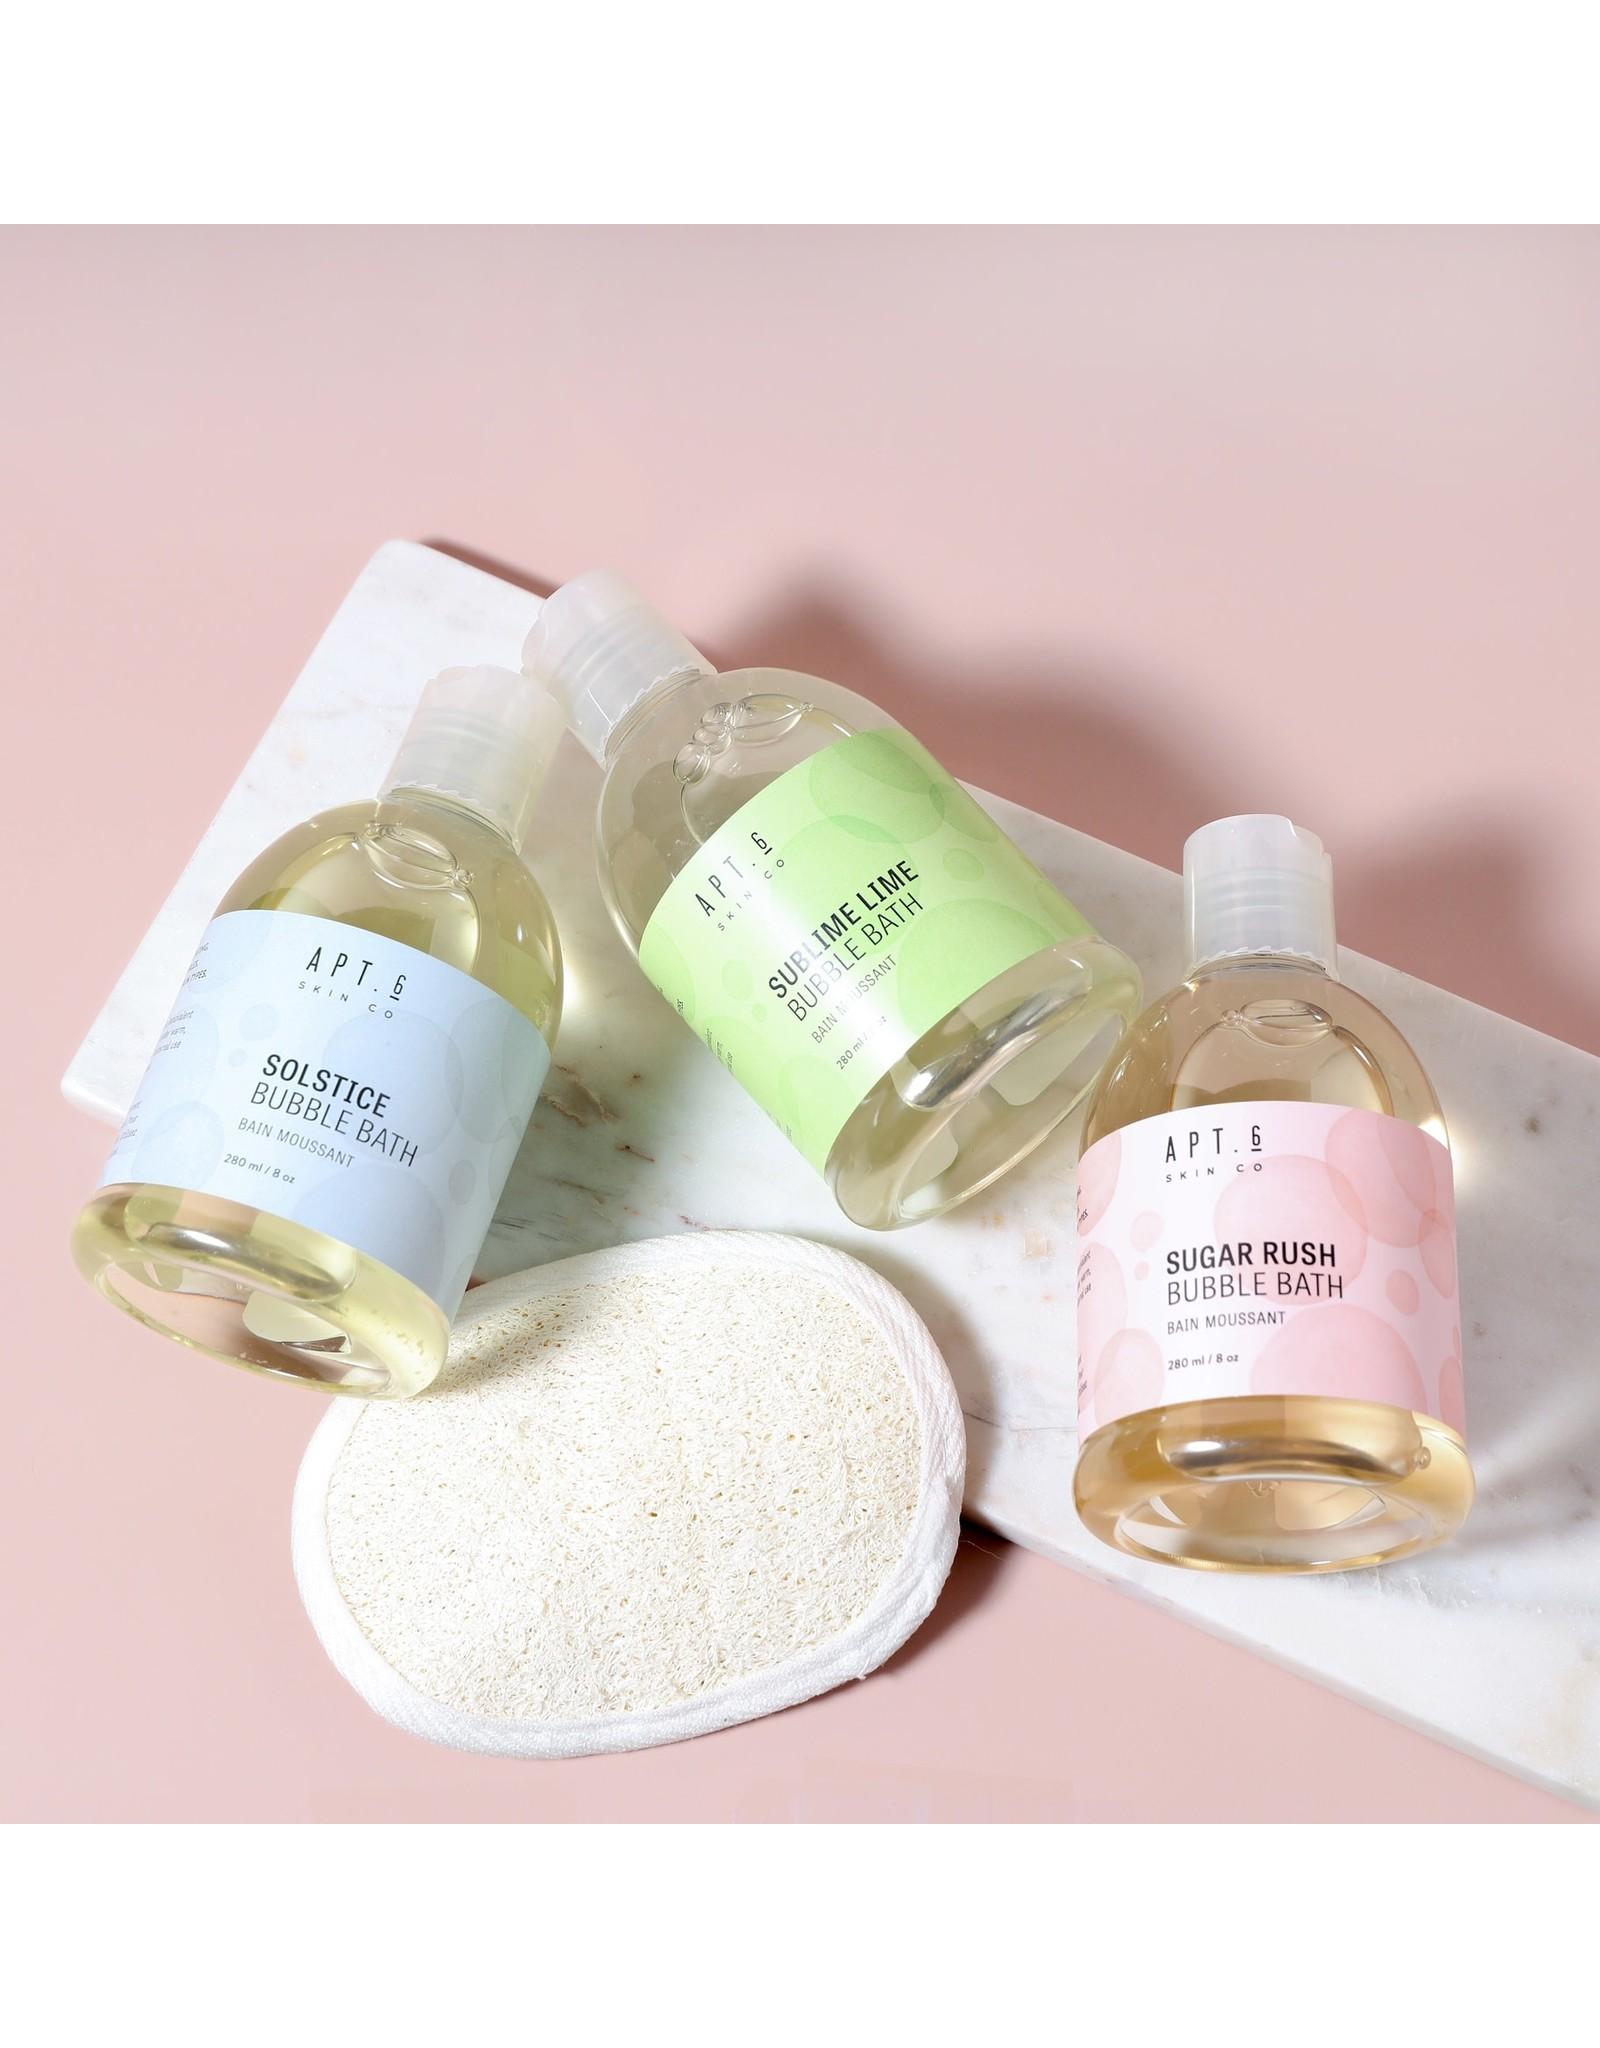 Apt. 6 Skin Co. Bubble Bath | Solstice